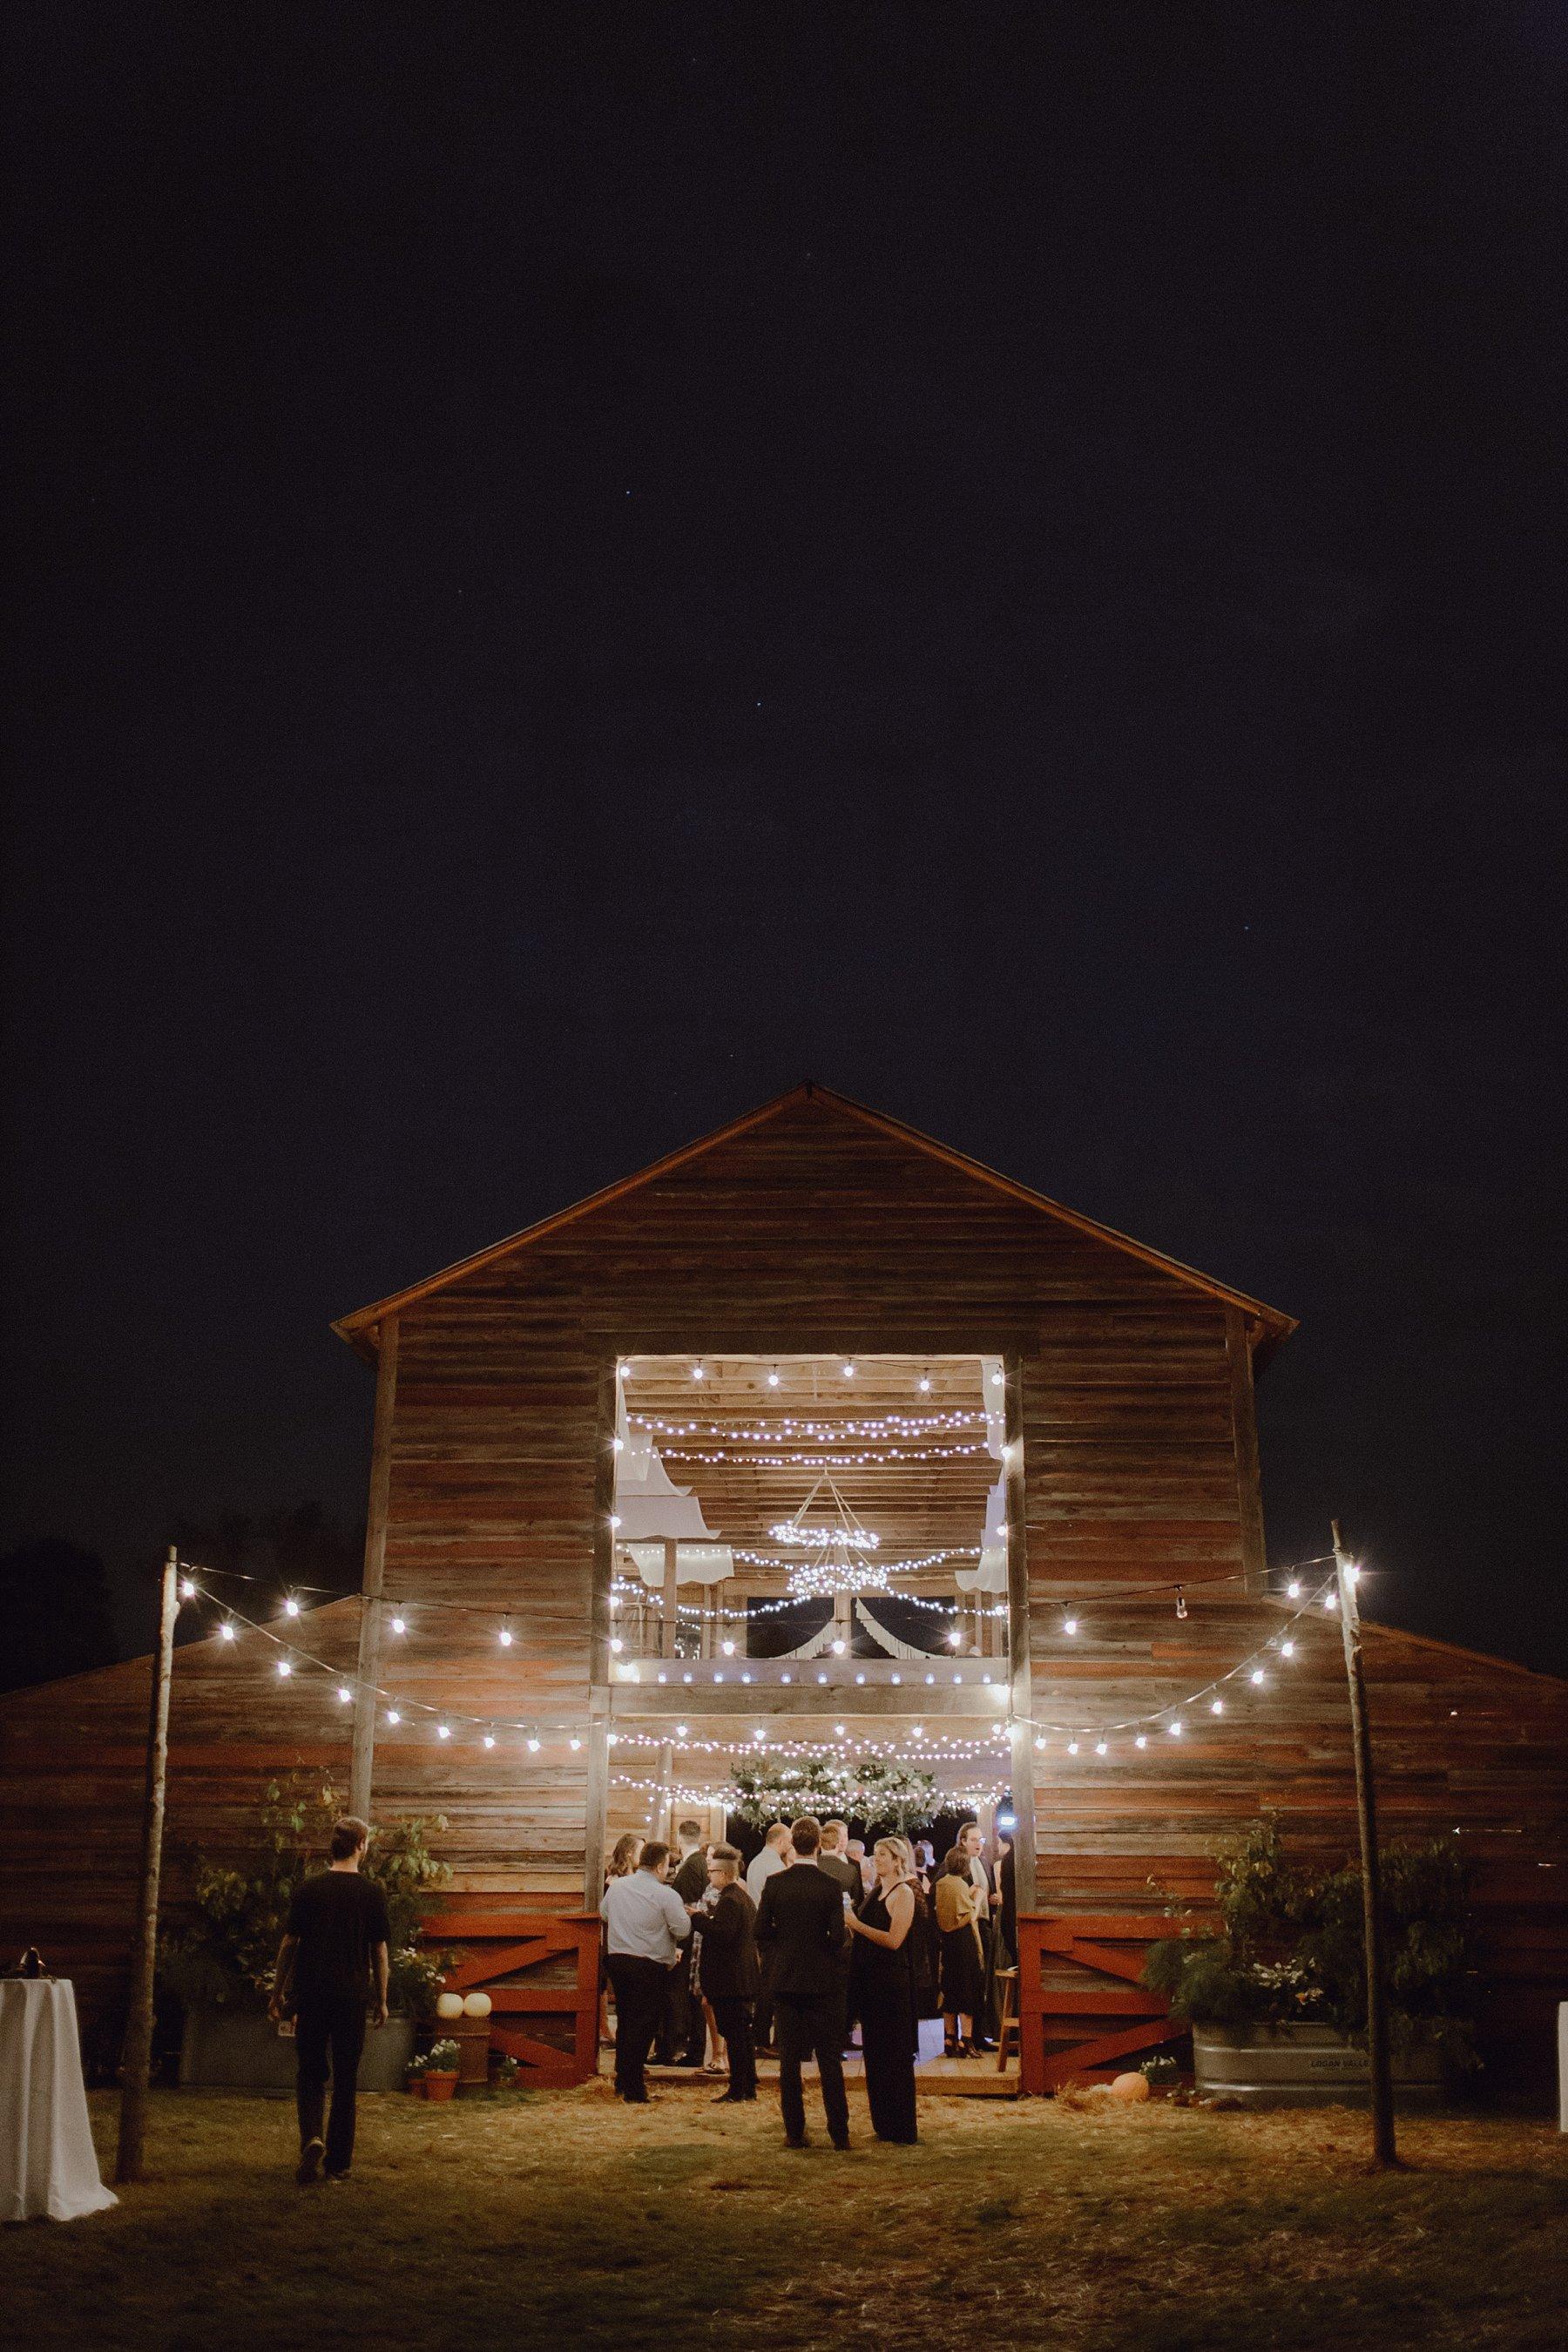 Sweet Olive Farm at night